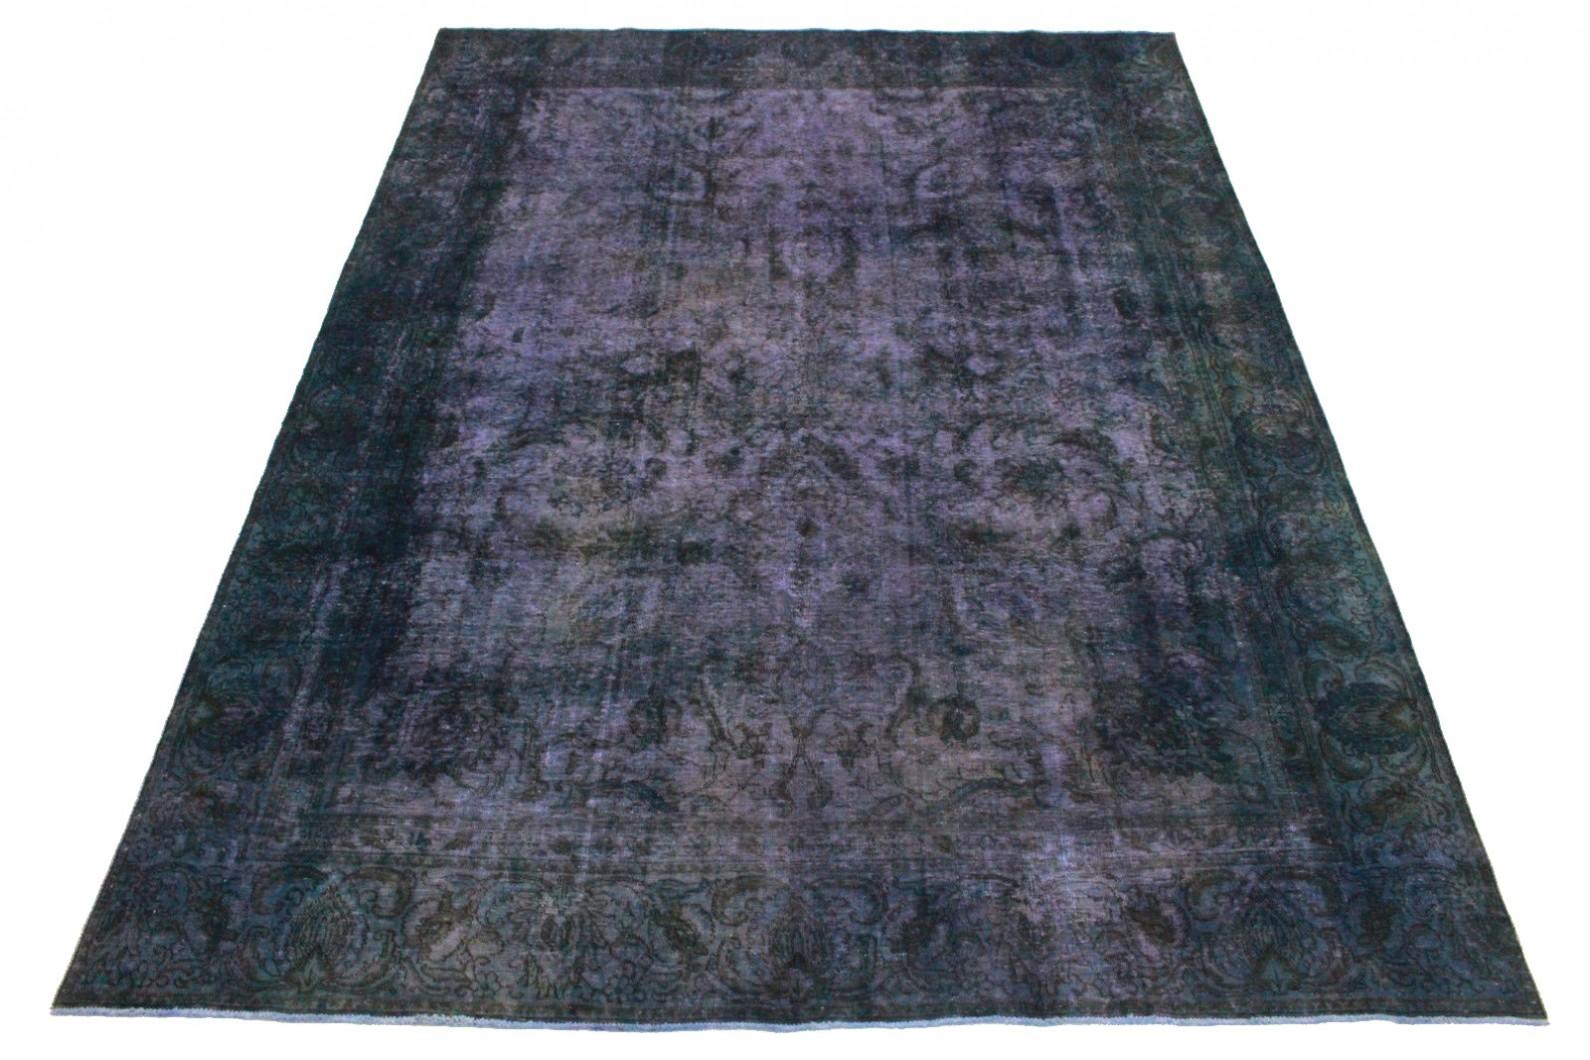 Vintage Teppich Lila in 370x280cm (1 / 11)